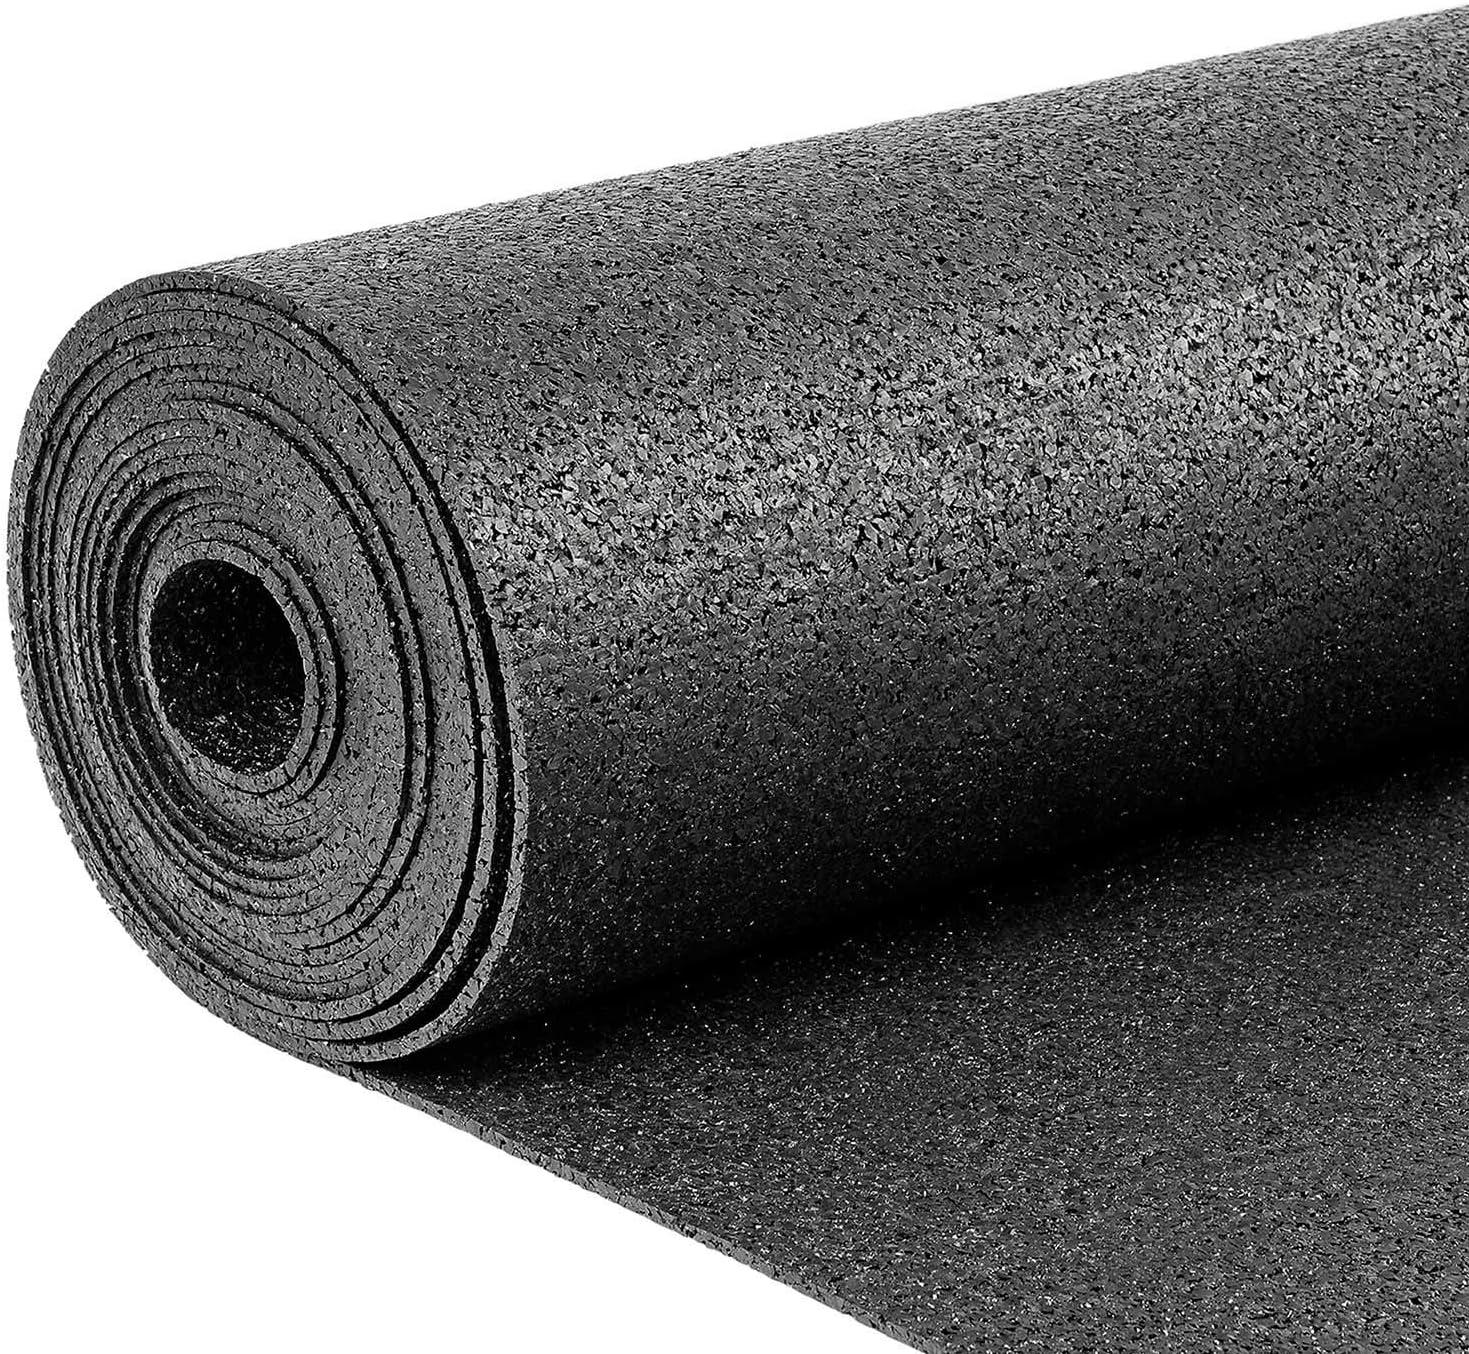 3mm Bautenschutzmatte 4m/² Gummigranulatmatte 1,50m x 2,67m St/ärke